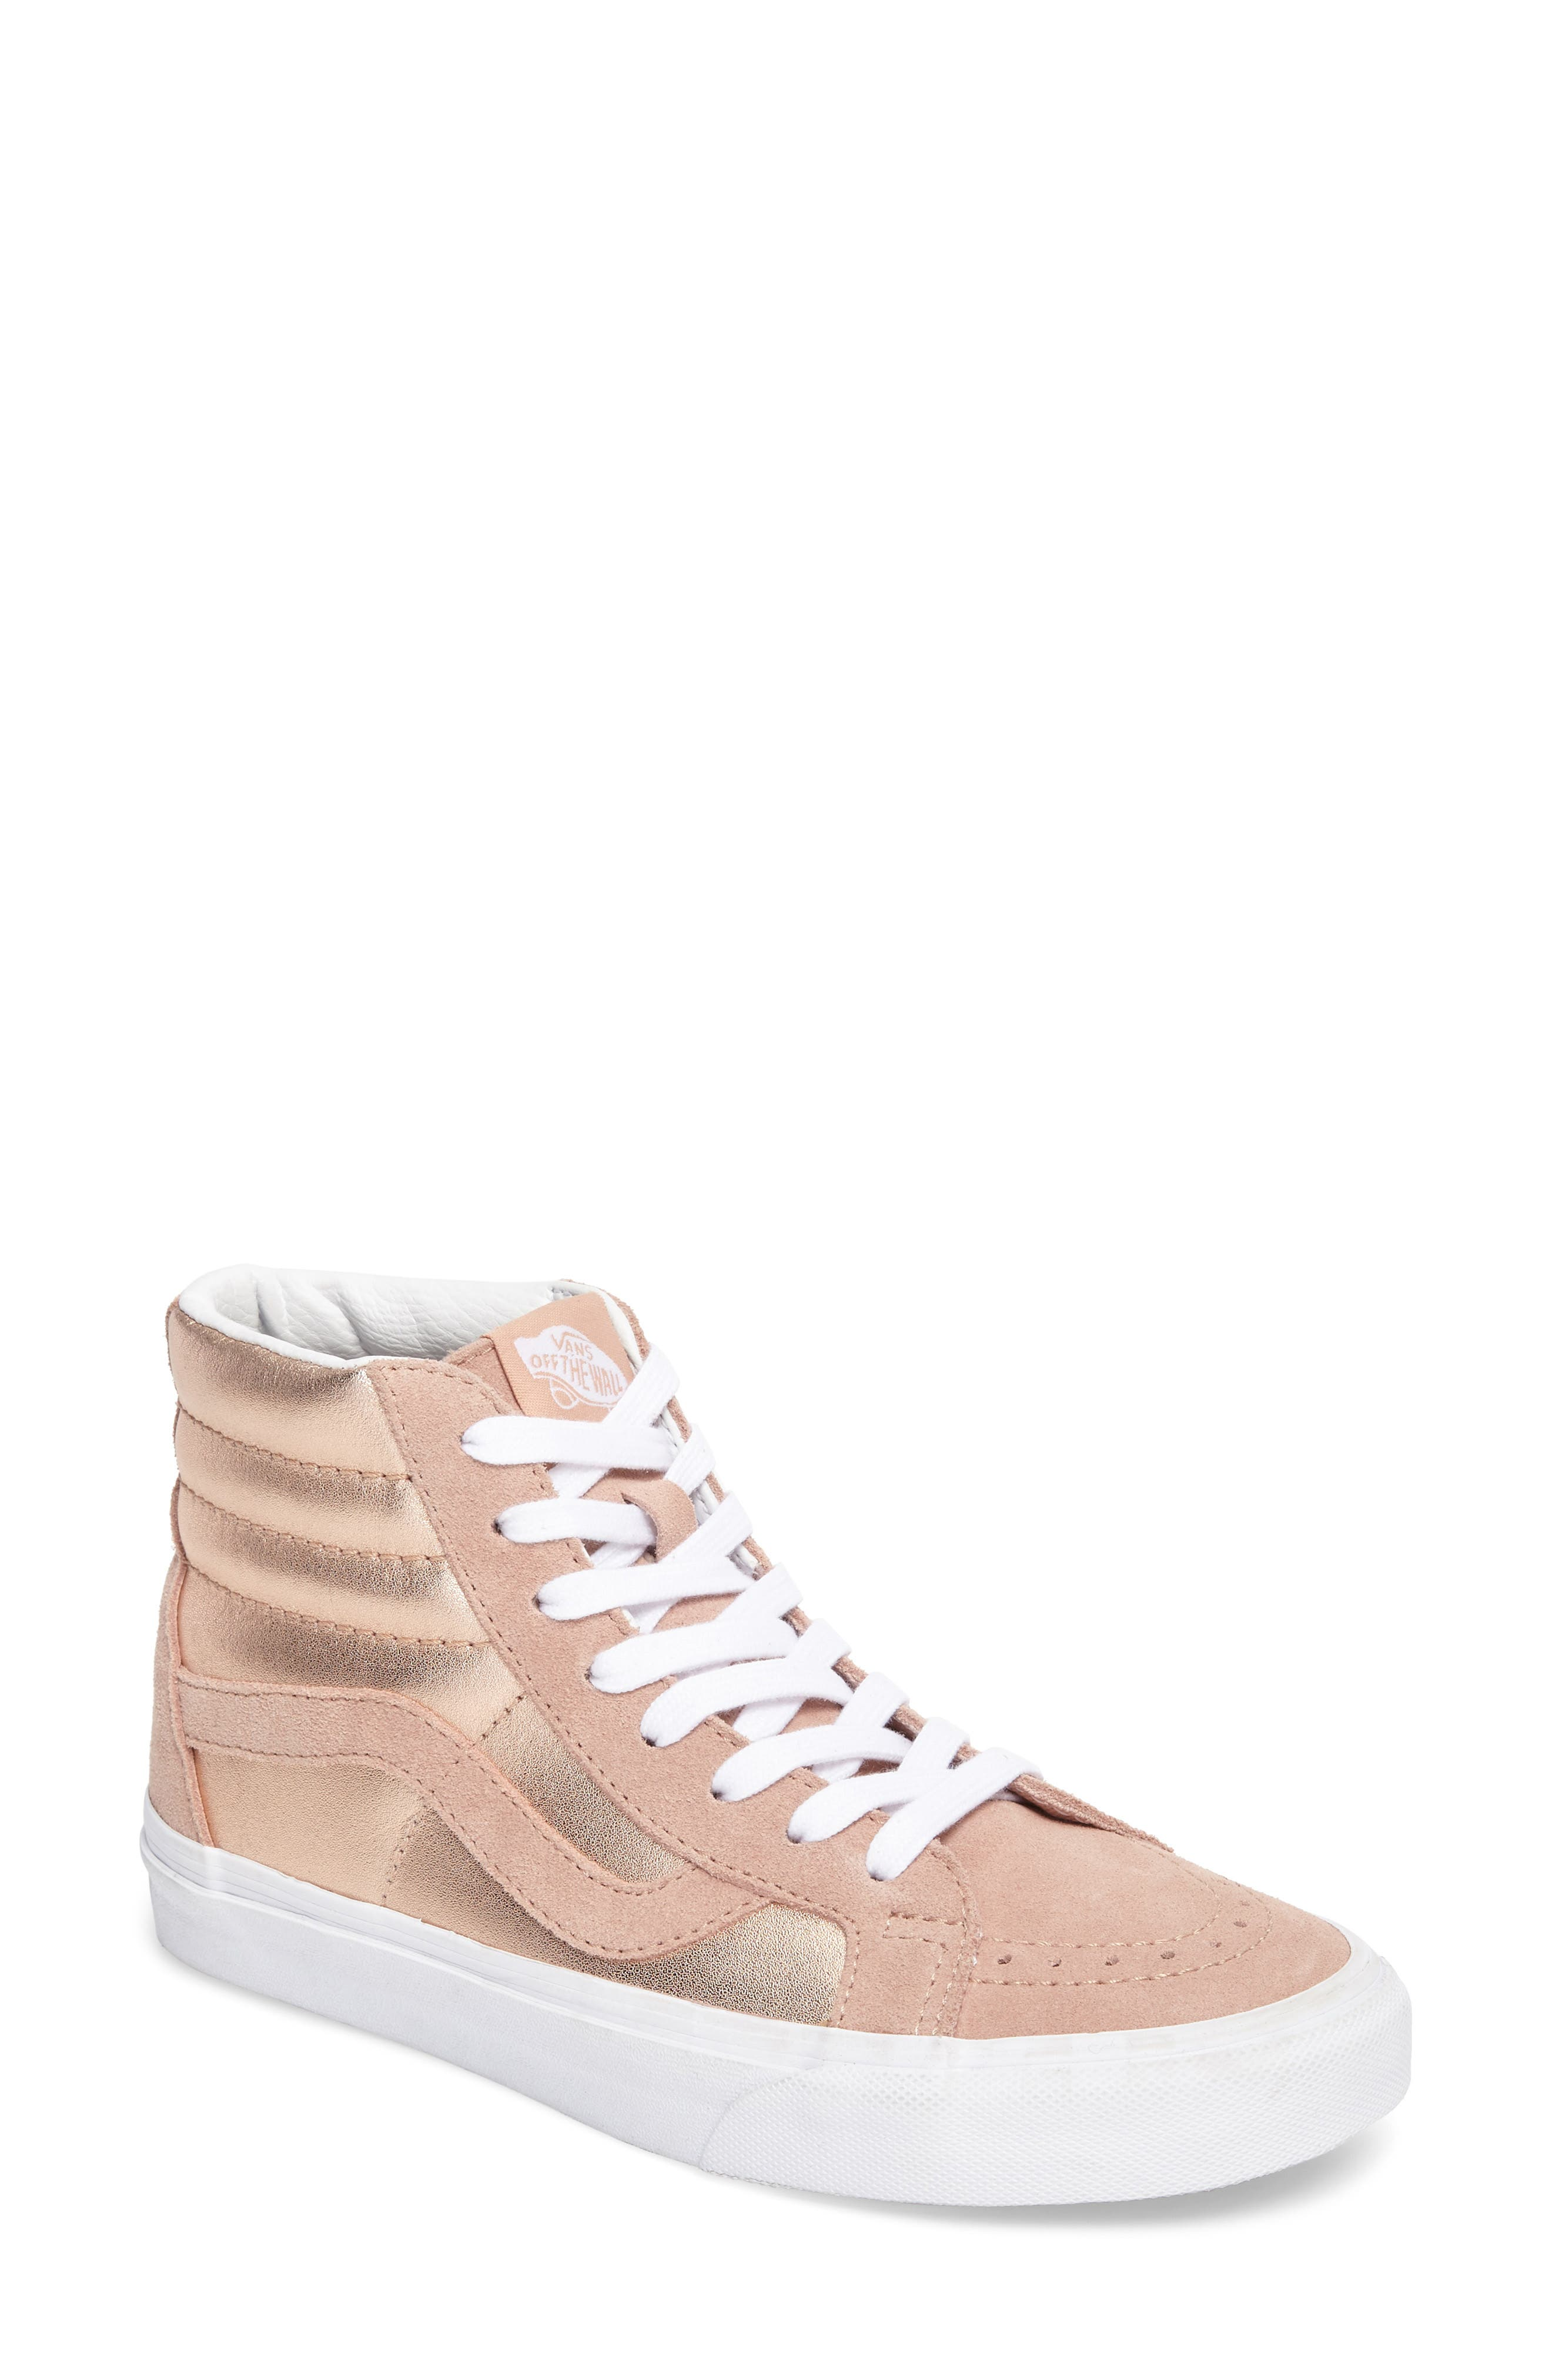 Main Image - Vans 'Sk8-Hi Reissue' Sneaker (Women)